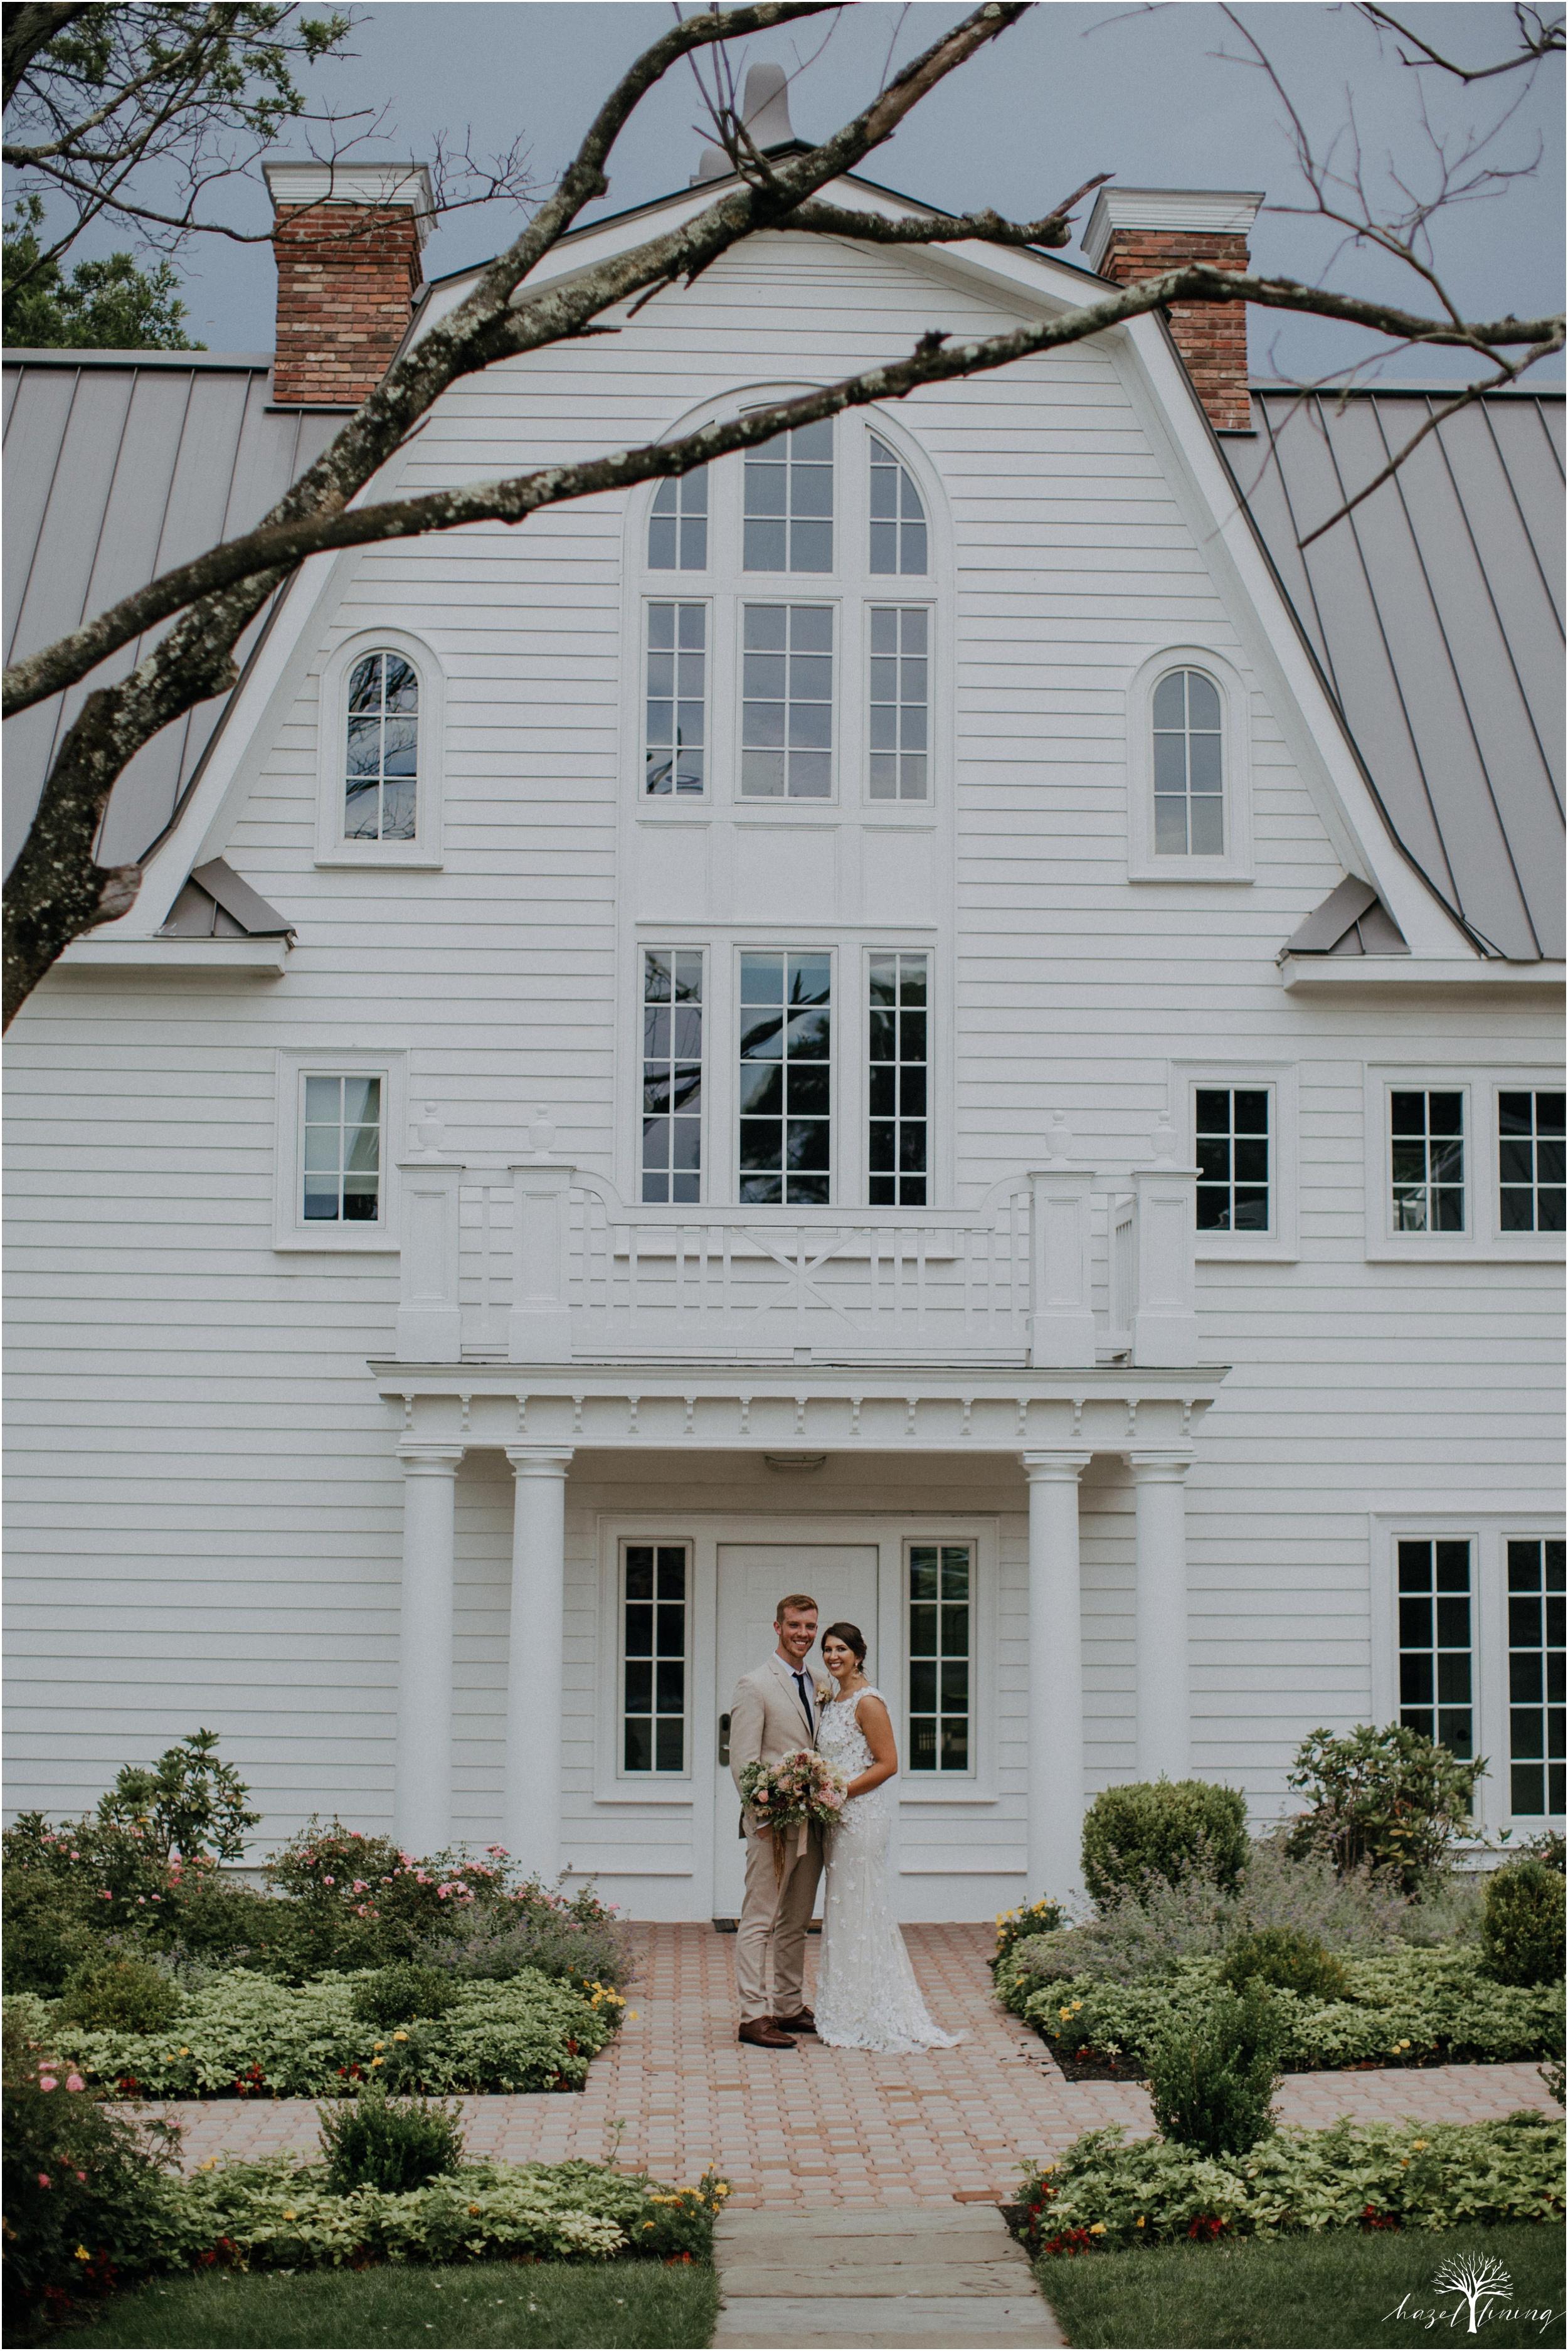 carl-chloe-the-ryland-inn-whitehouse-station-new-jersey-styled-squad-hazel-lining-photography-destination-elopement-wedding-engagement-photography_0029.jpg